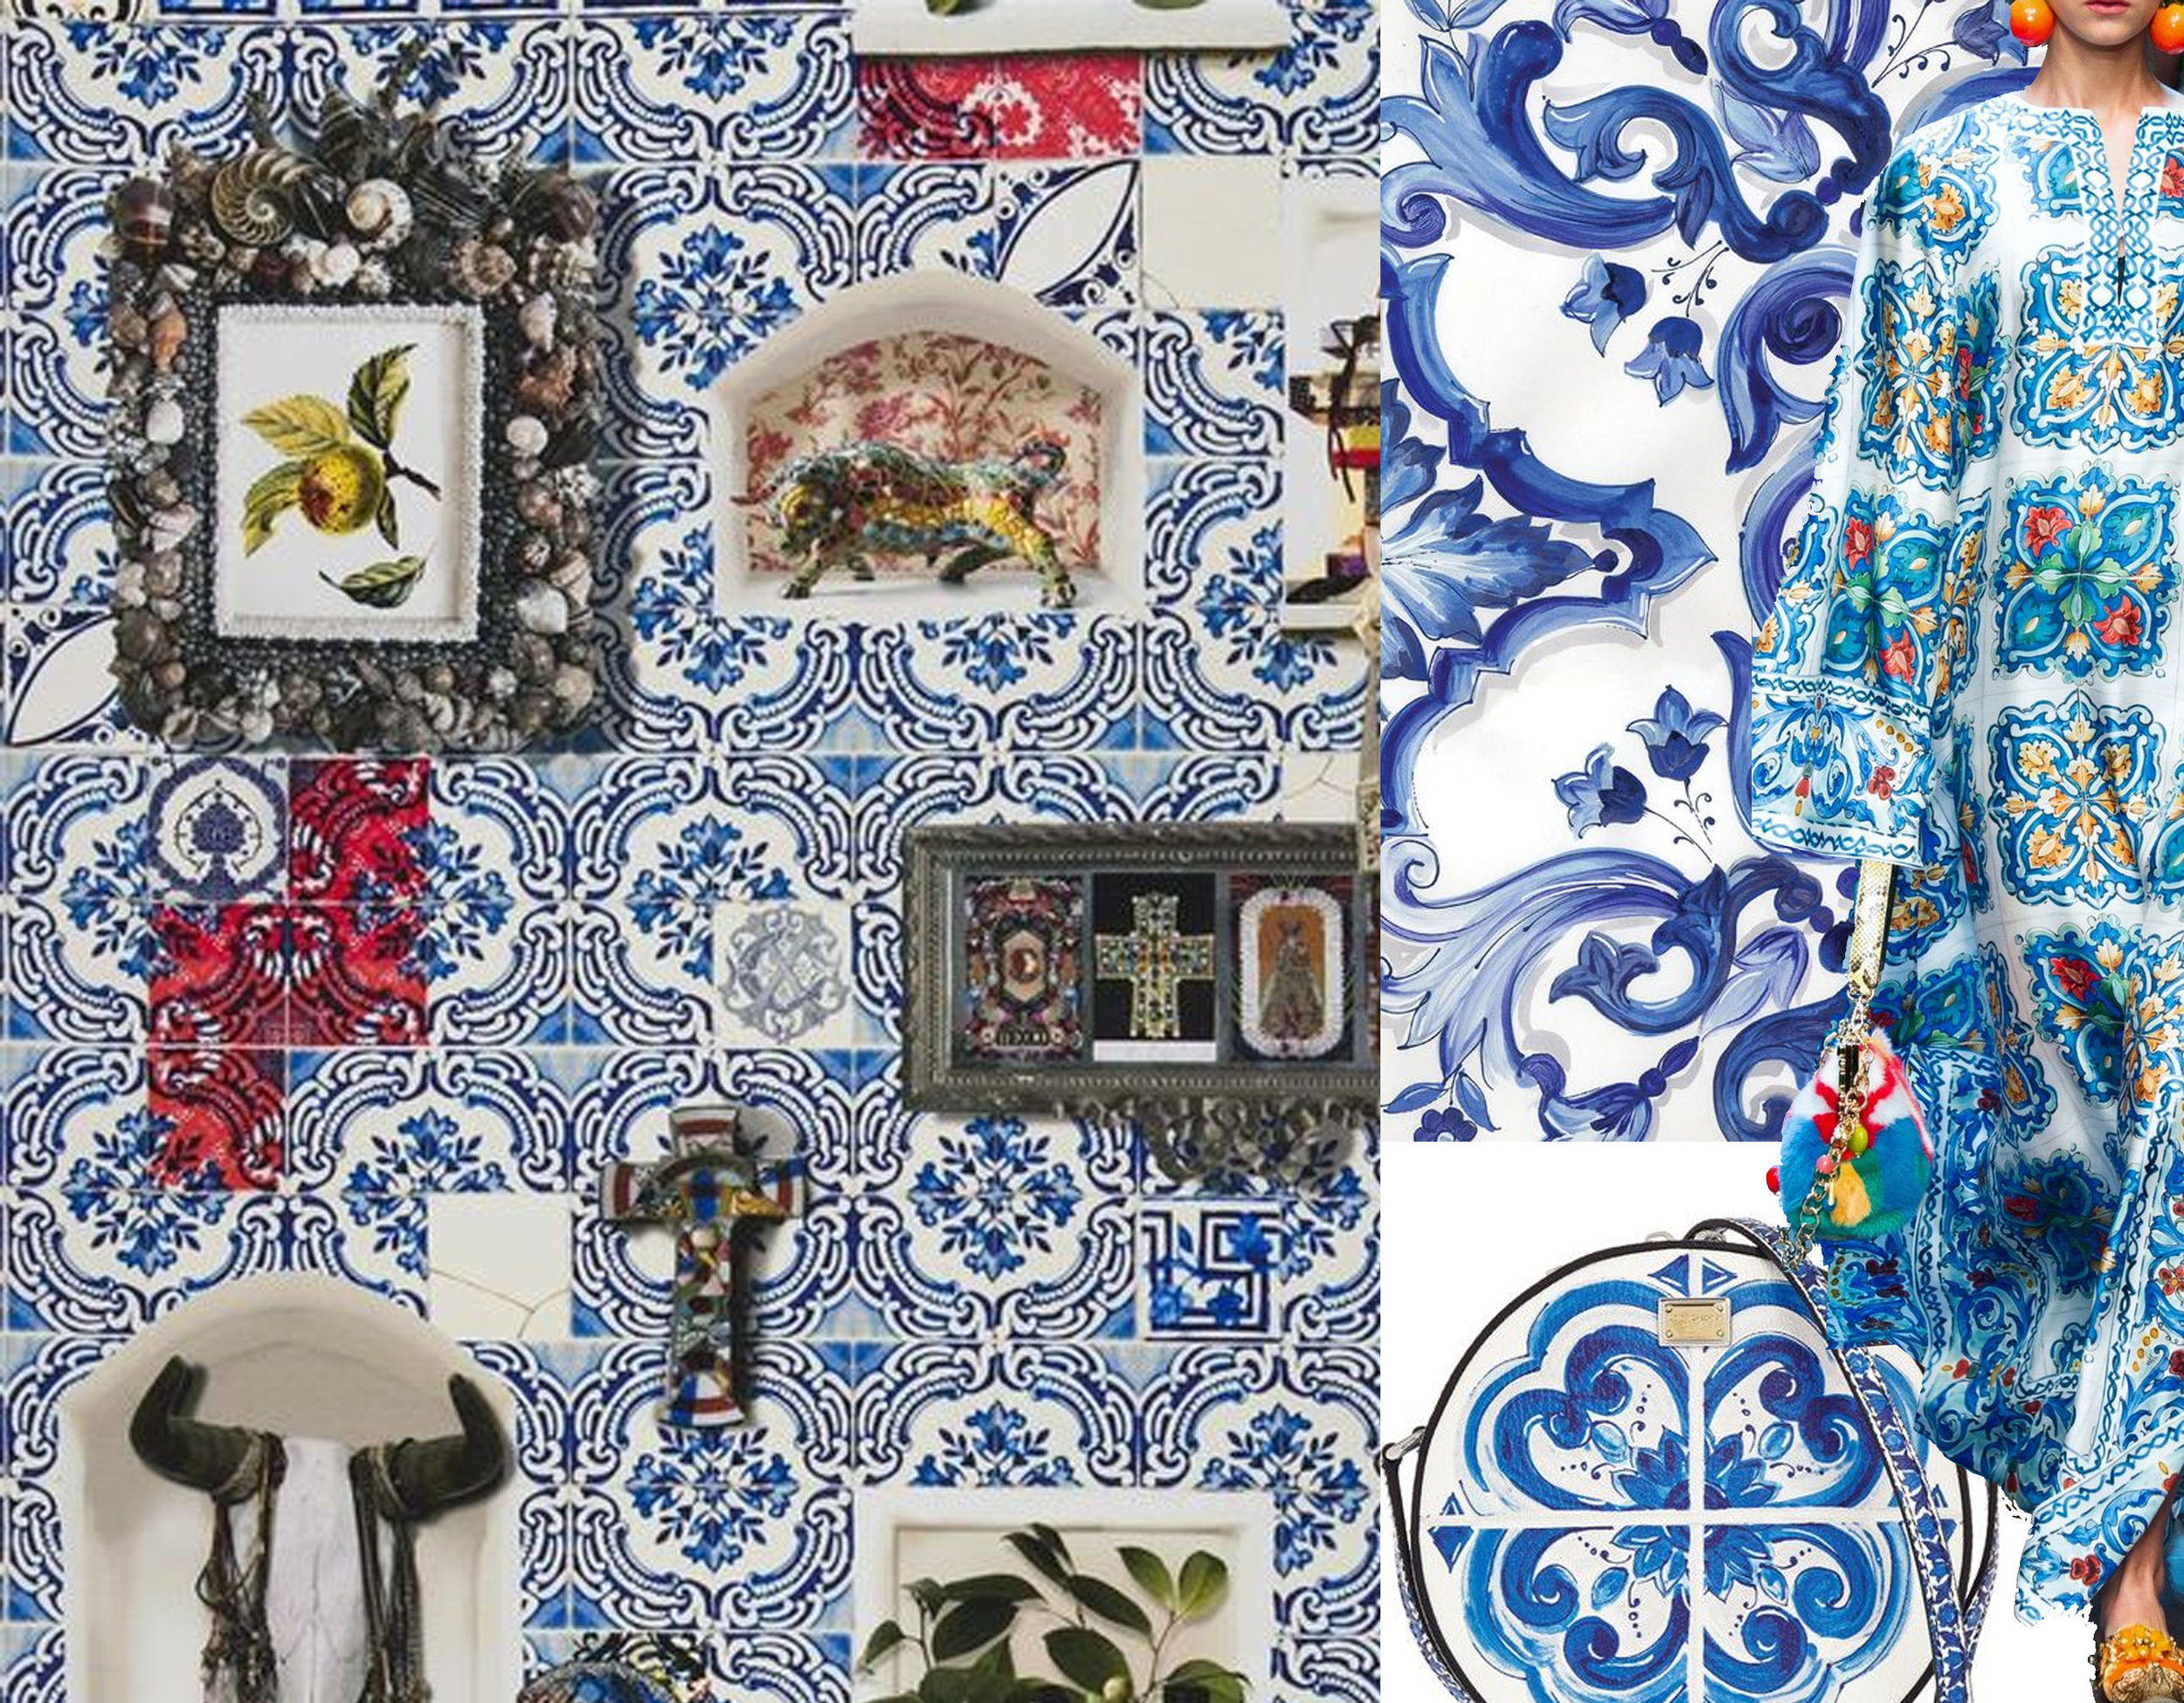 Patio wallpaper Christian Lacroix for  Designers Guild  -  Dolce & Gabbana  winter 2016